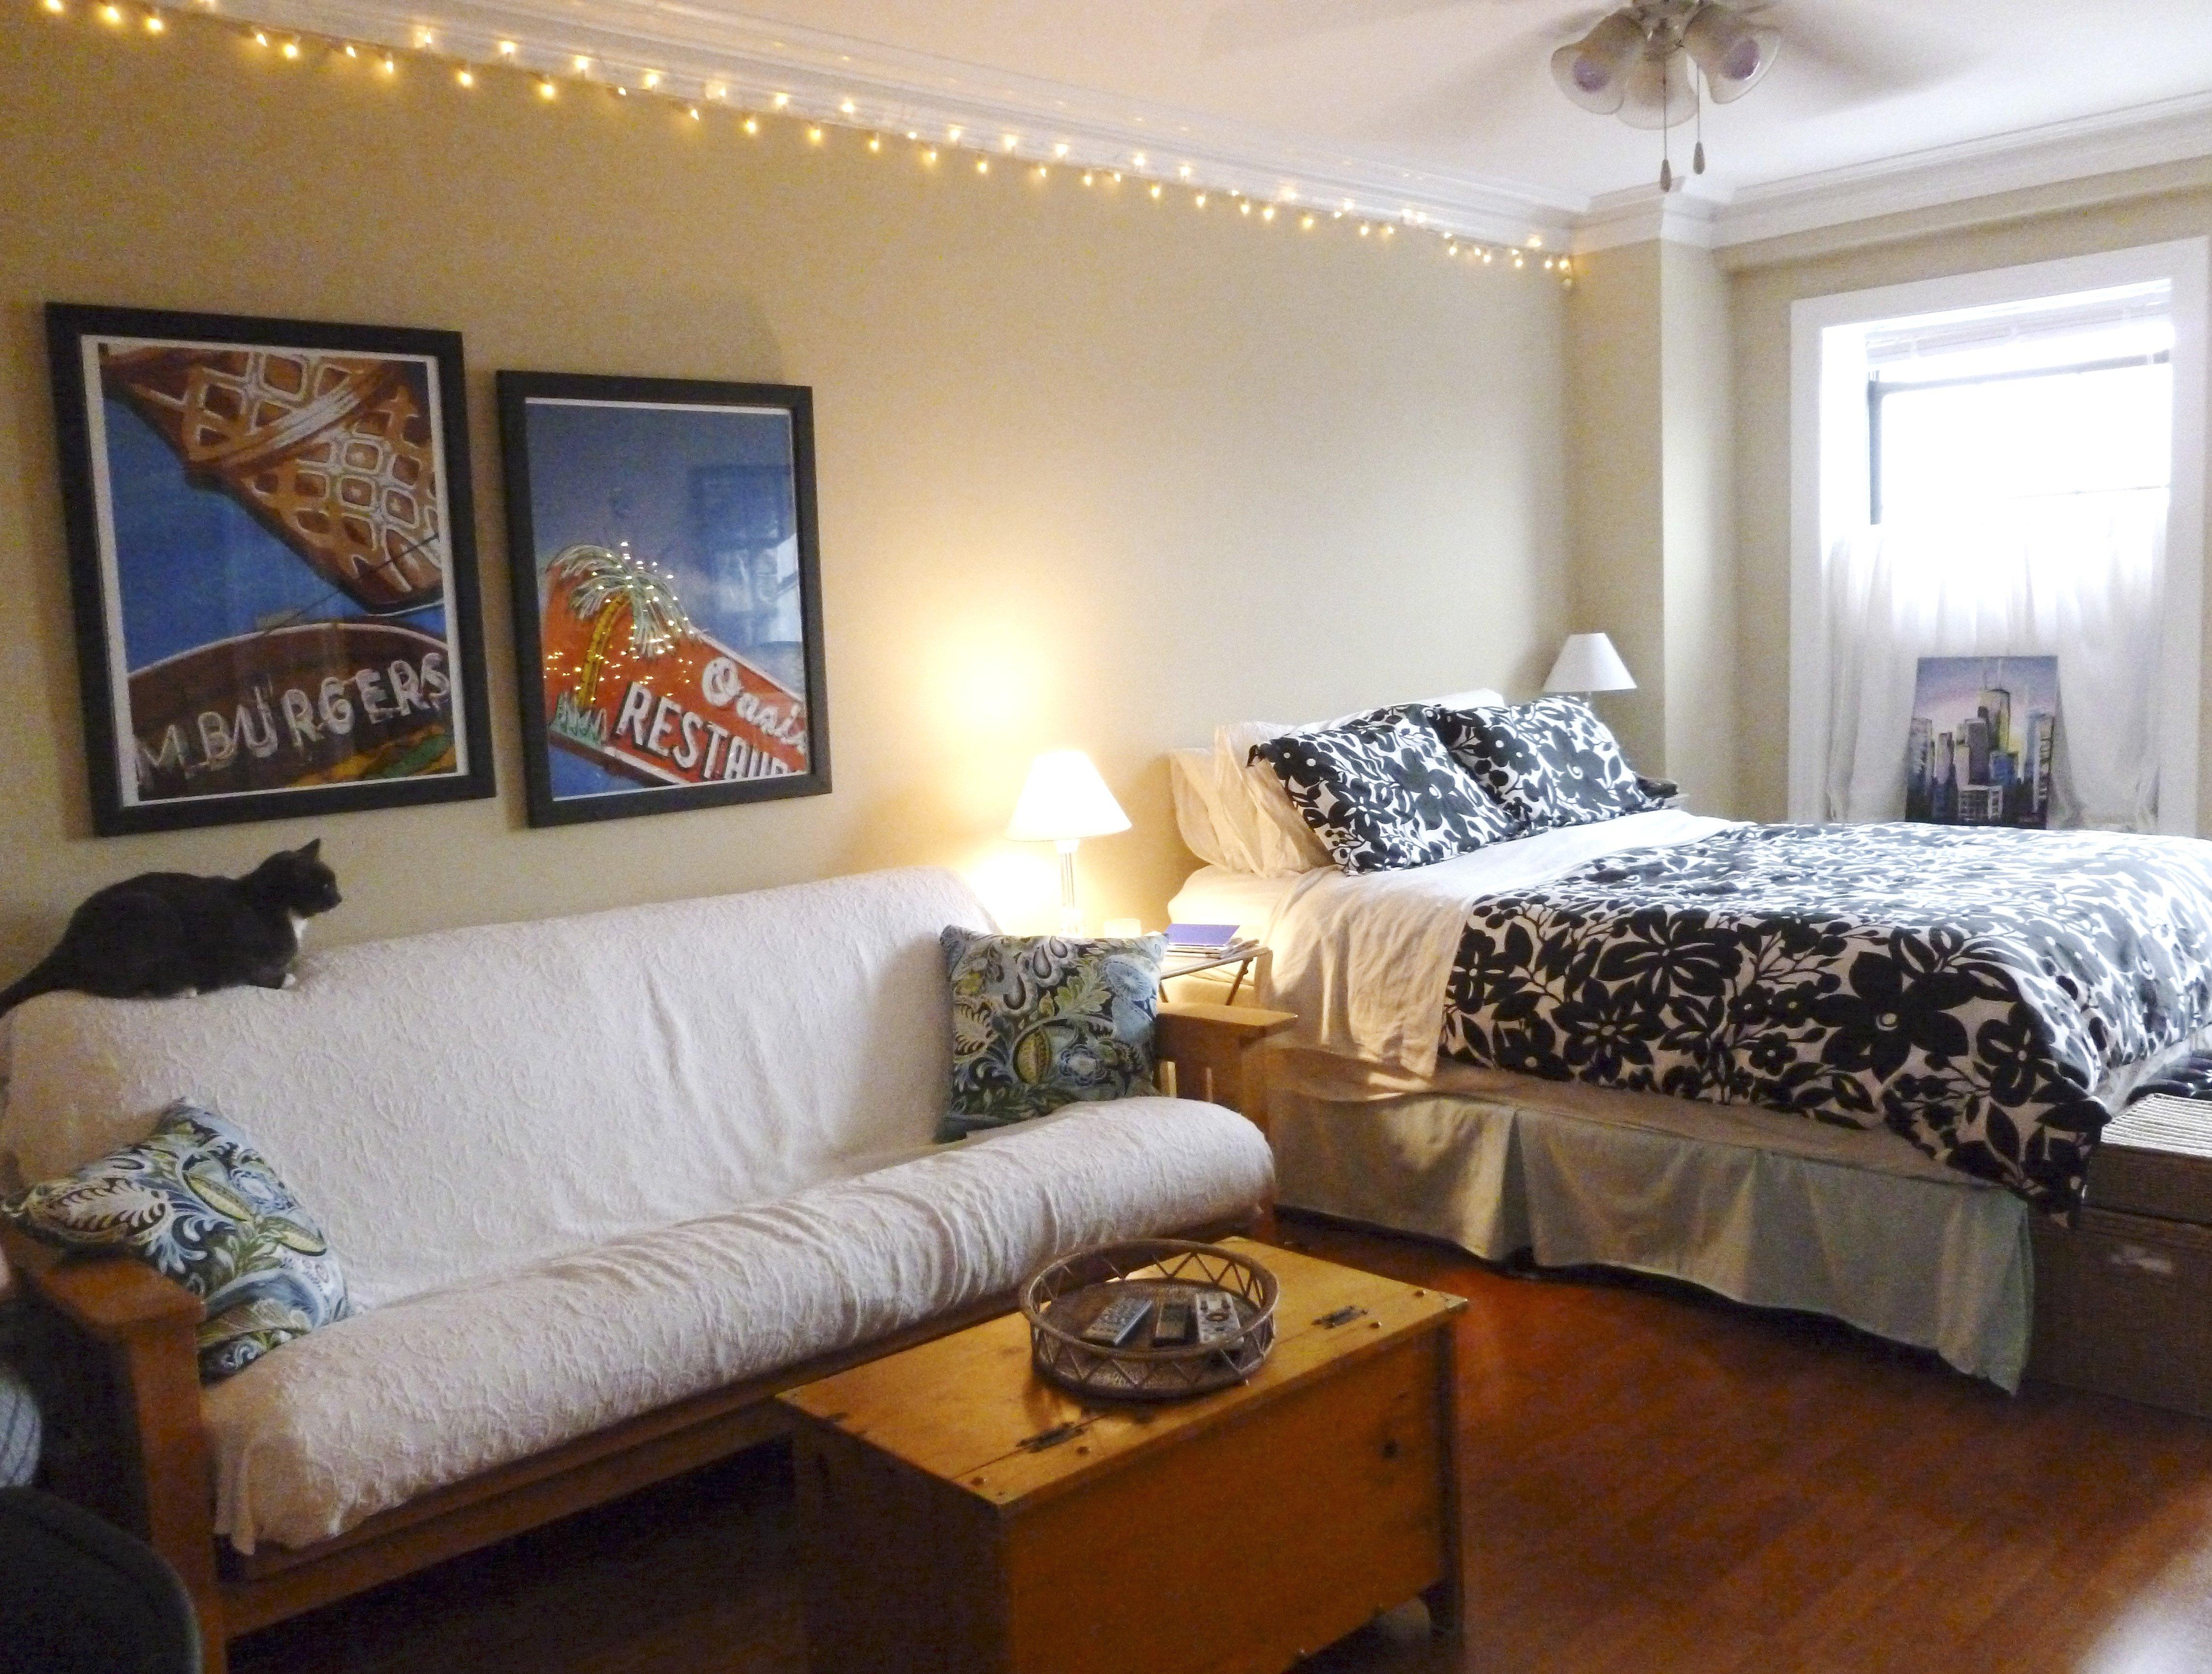 10 Pretty Decorating Ideas For Studio Apartments beautiful design ideas for studio apartments small apartment on 2020